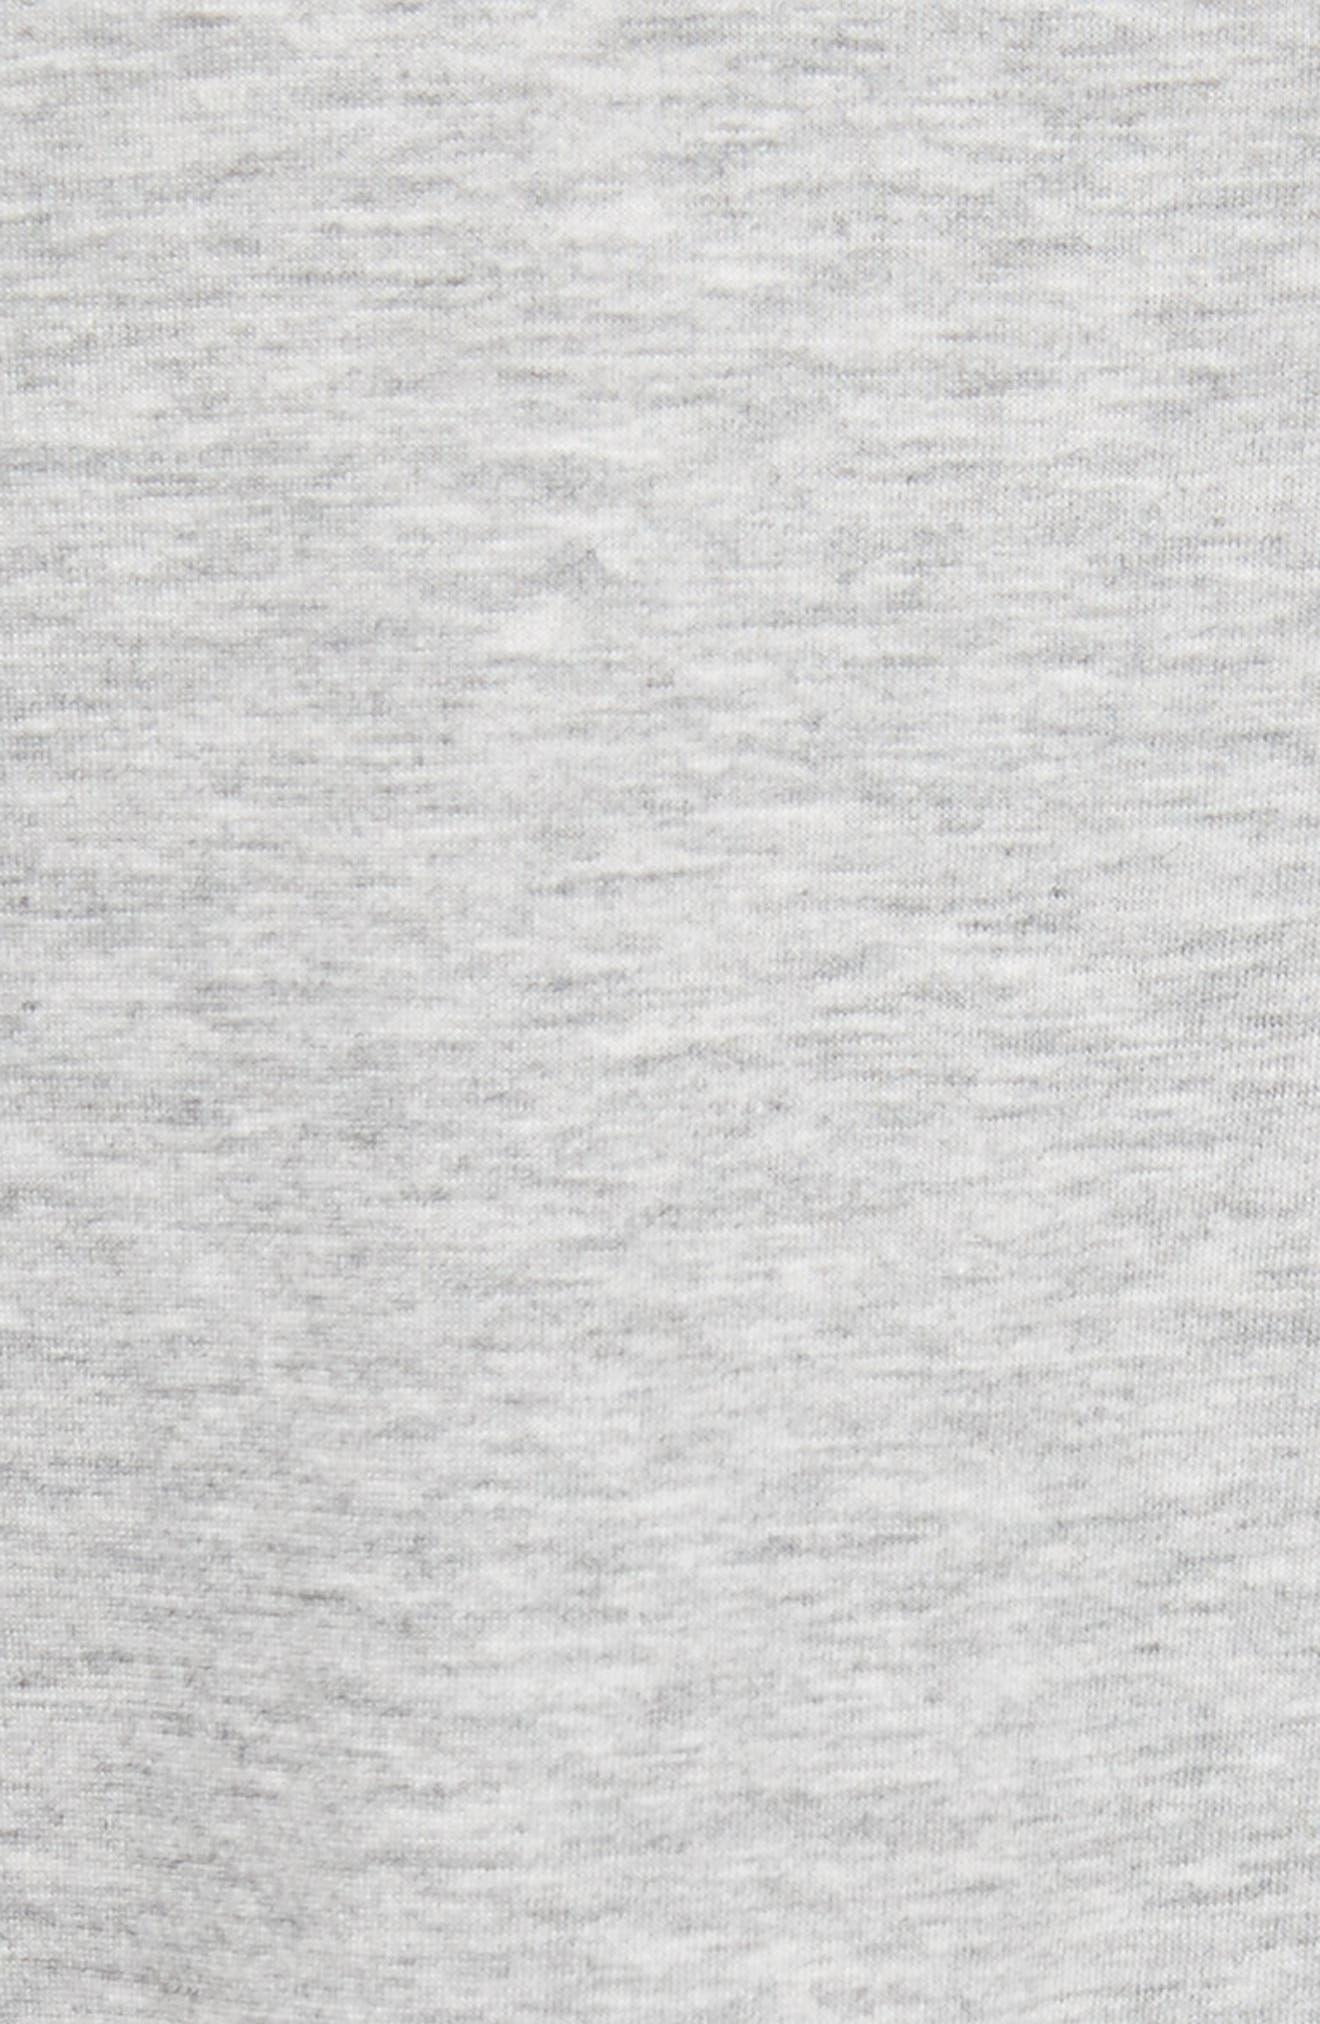 Bird Patch Jersey Top,                             Alternate thumbnail 5, color,                             Grey Heather